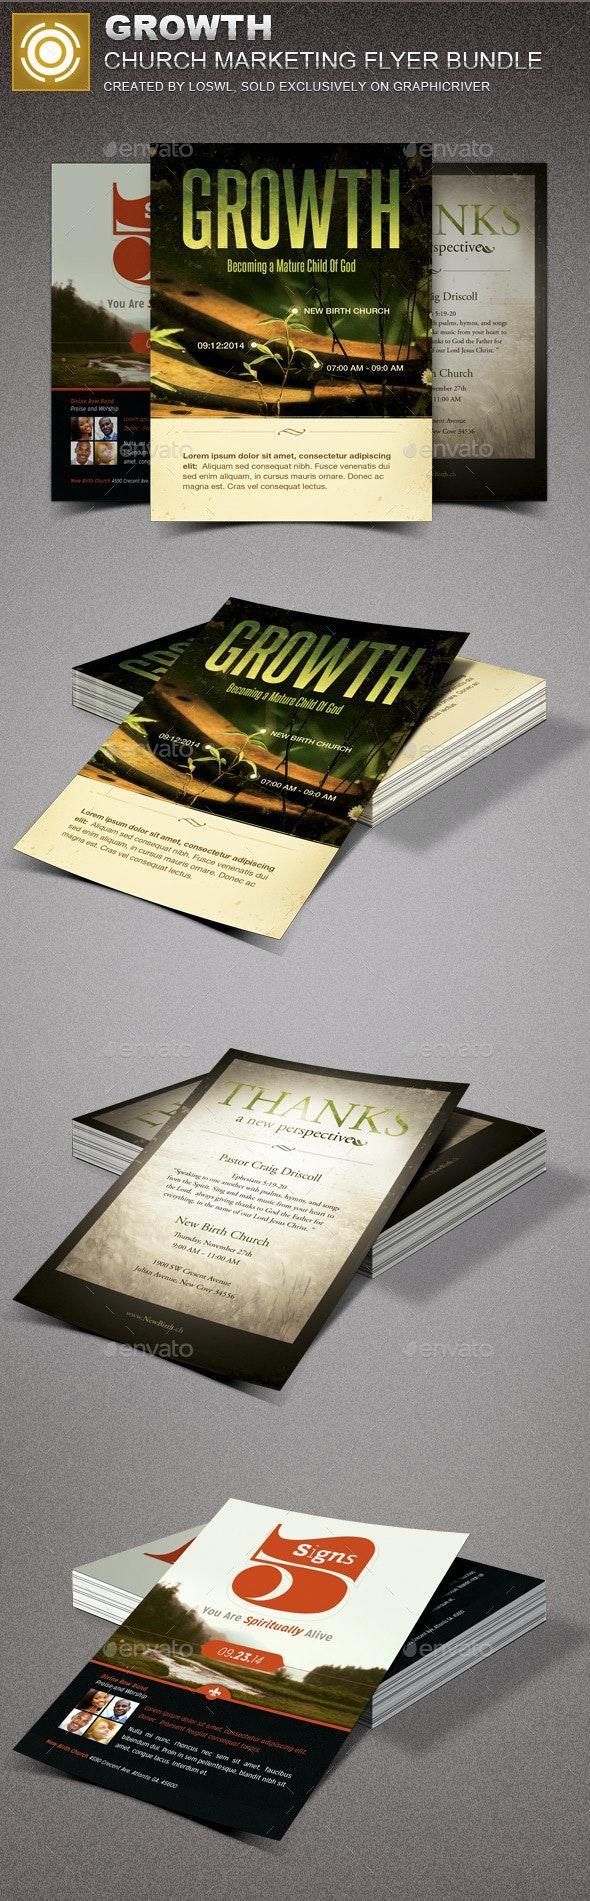 Growth Church Marketing Flyer Template Bundle - Church Flyers